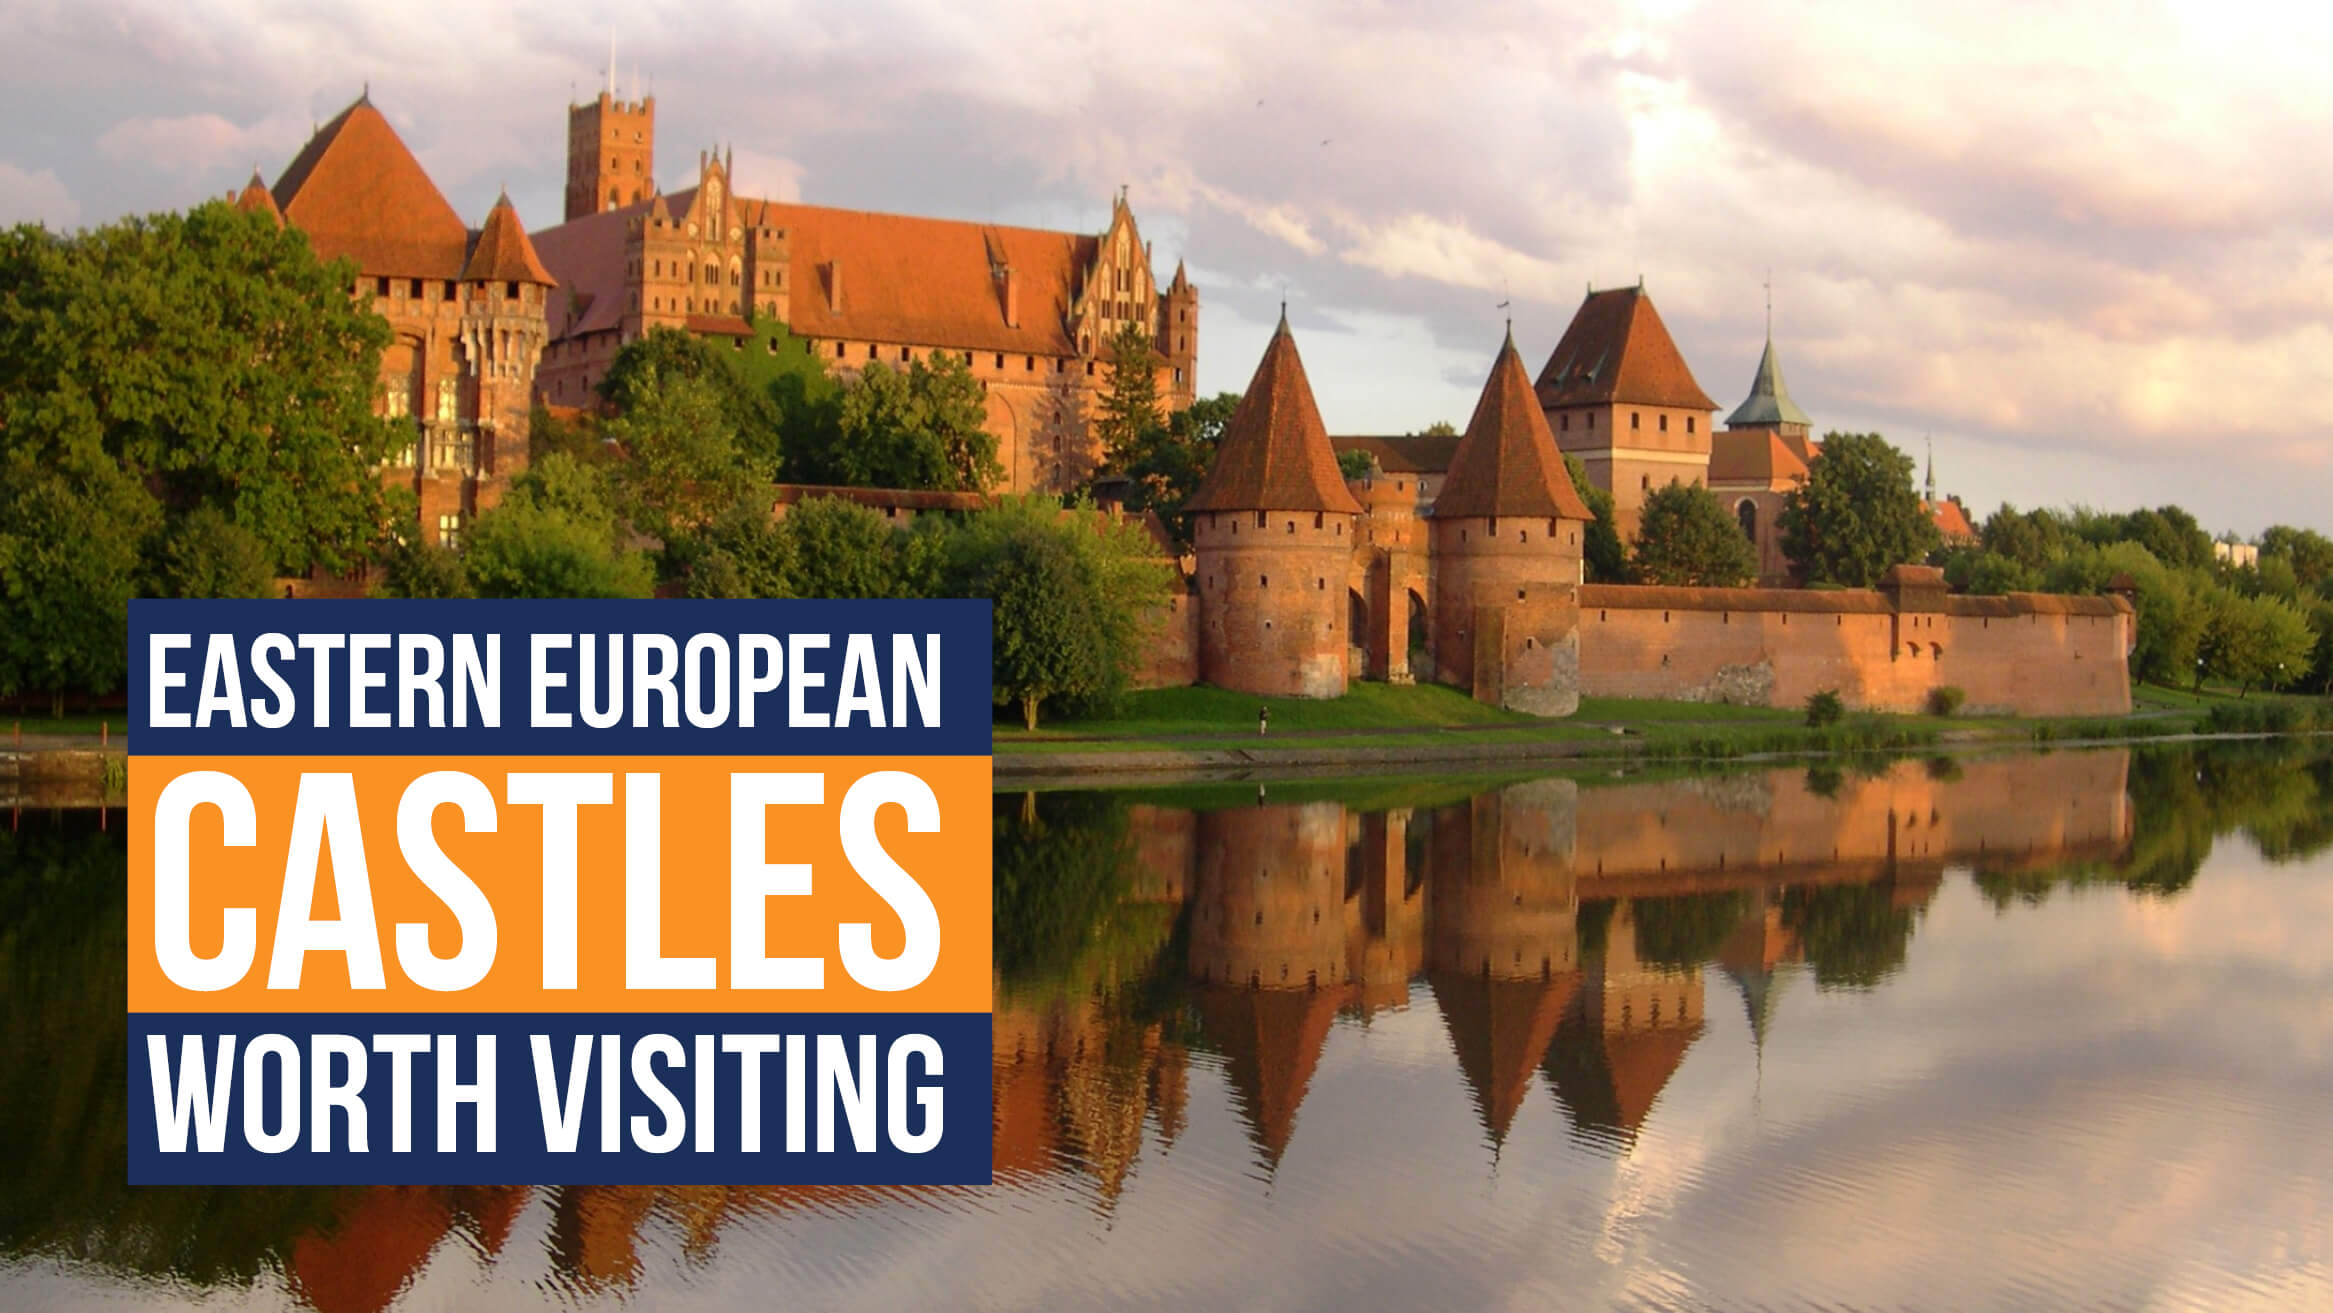 Eastern European Castles Worth Visiting